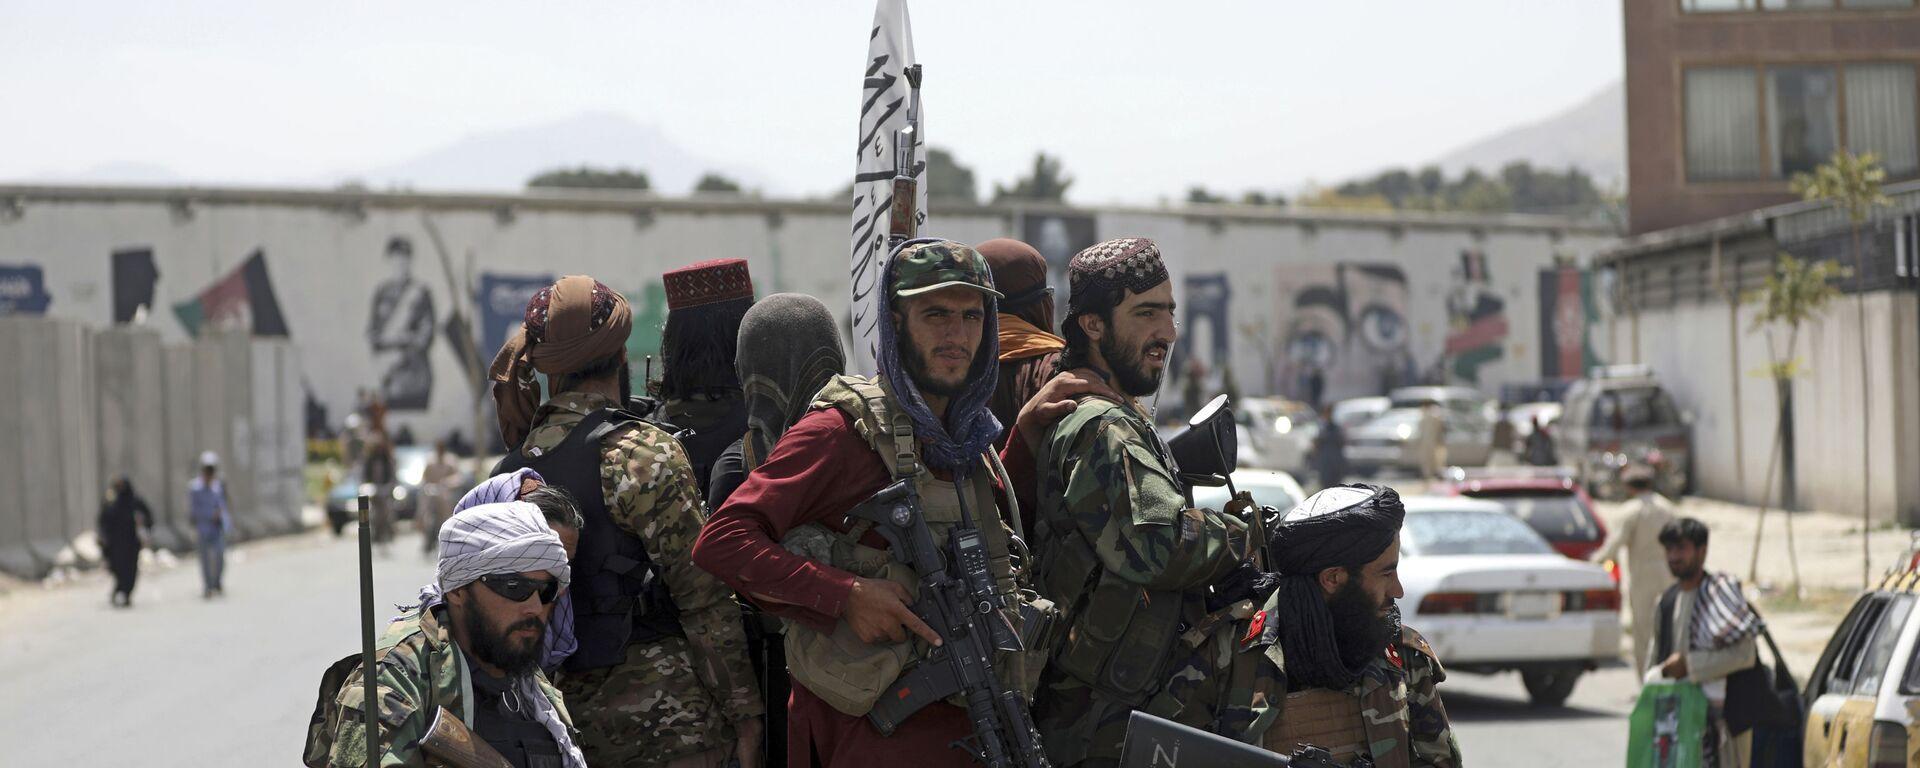 Taliban-Kämpfer in Kabul, Afghanistan - SNA, 1920, 15.09.2021